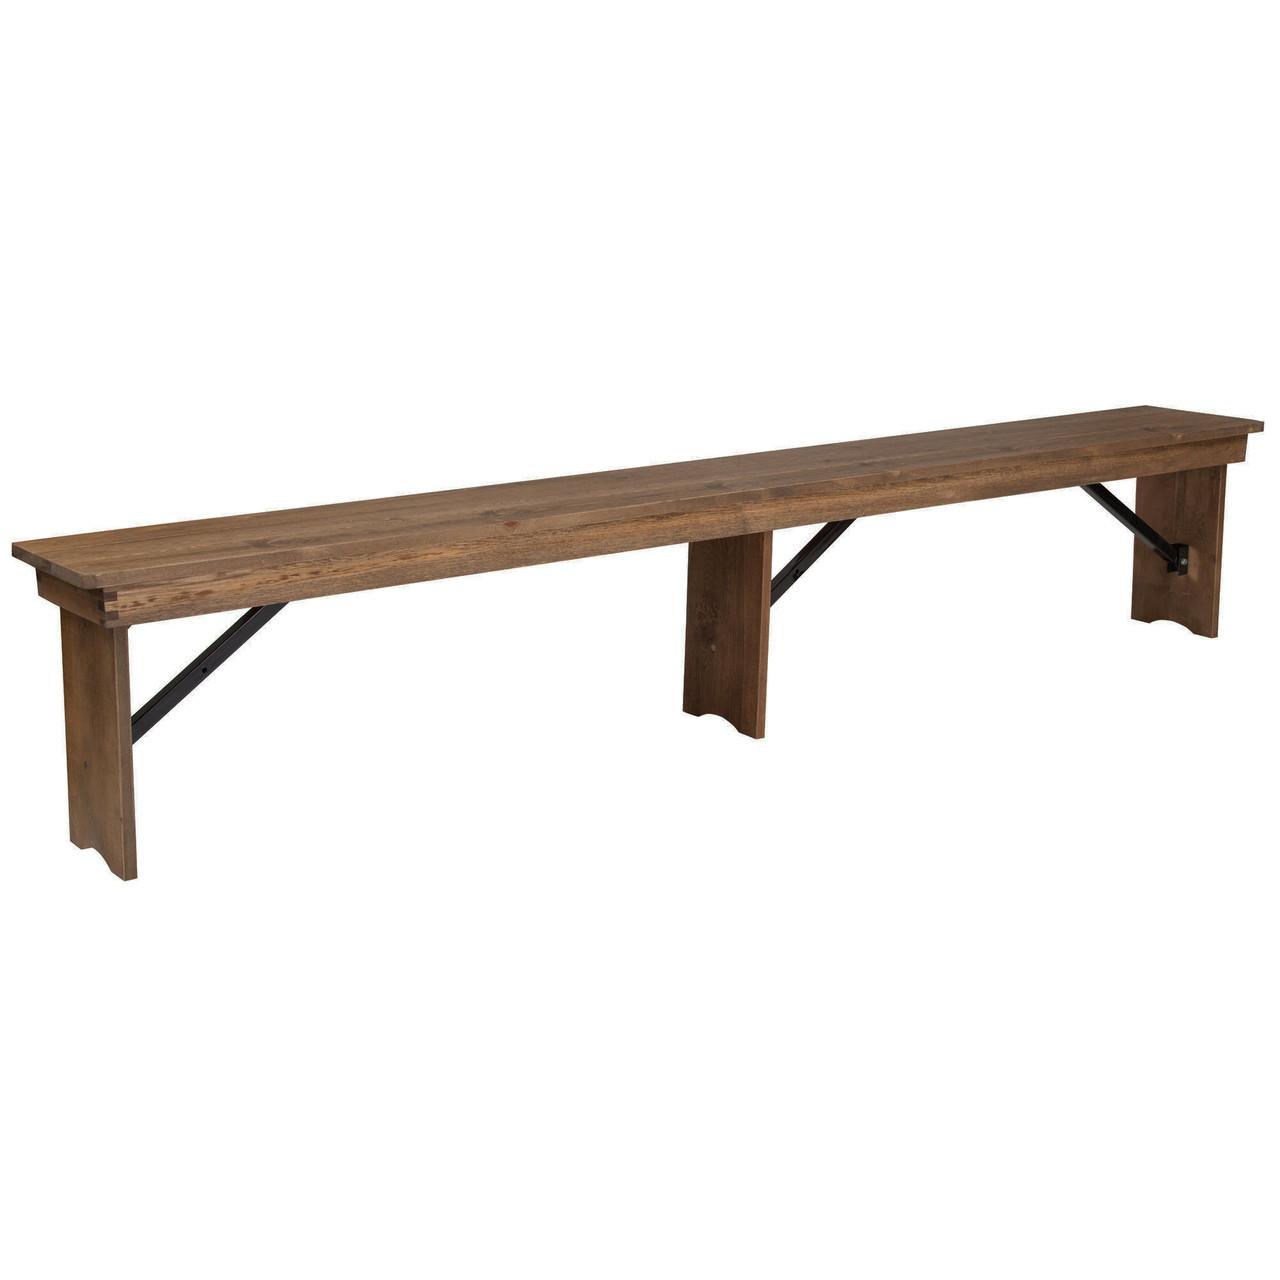 Awe Inspiring Advantage Antique Rustic Solid Pine Farmhouse Table Bench 12 In X 96 In Xa B 96X12 L Gg Machost Co Dining Chair Design Ideas Machostcouk